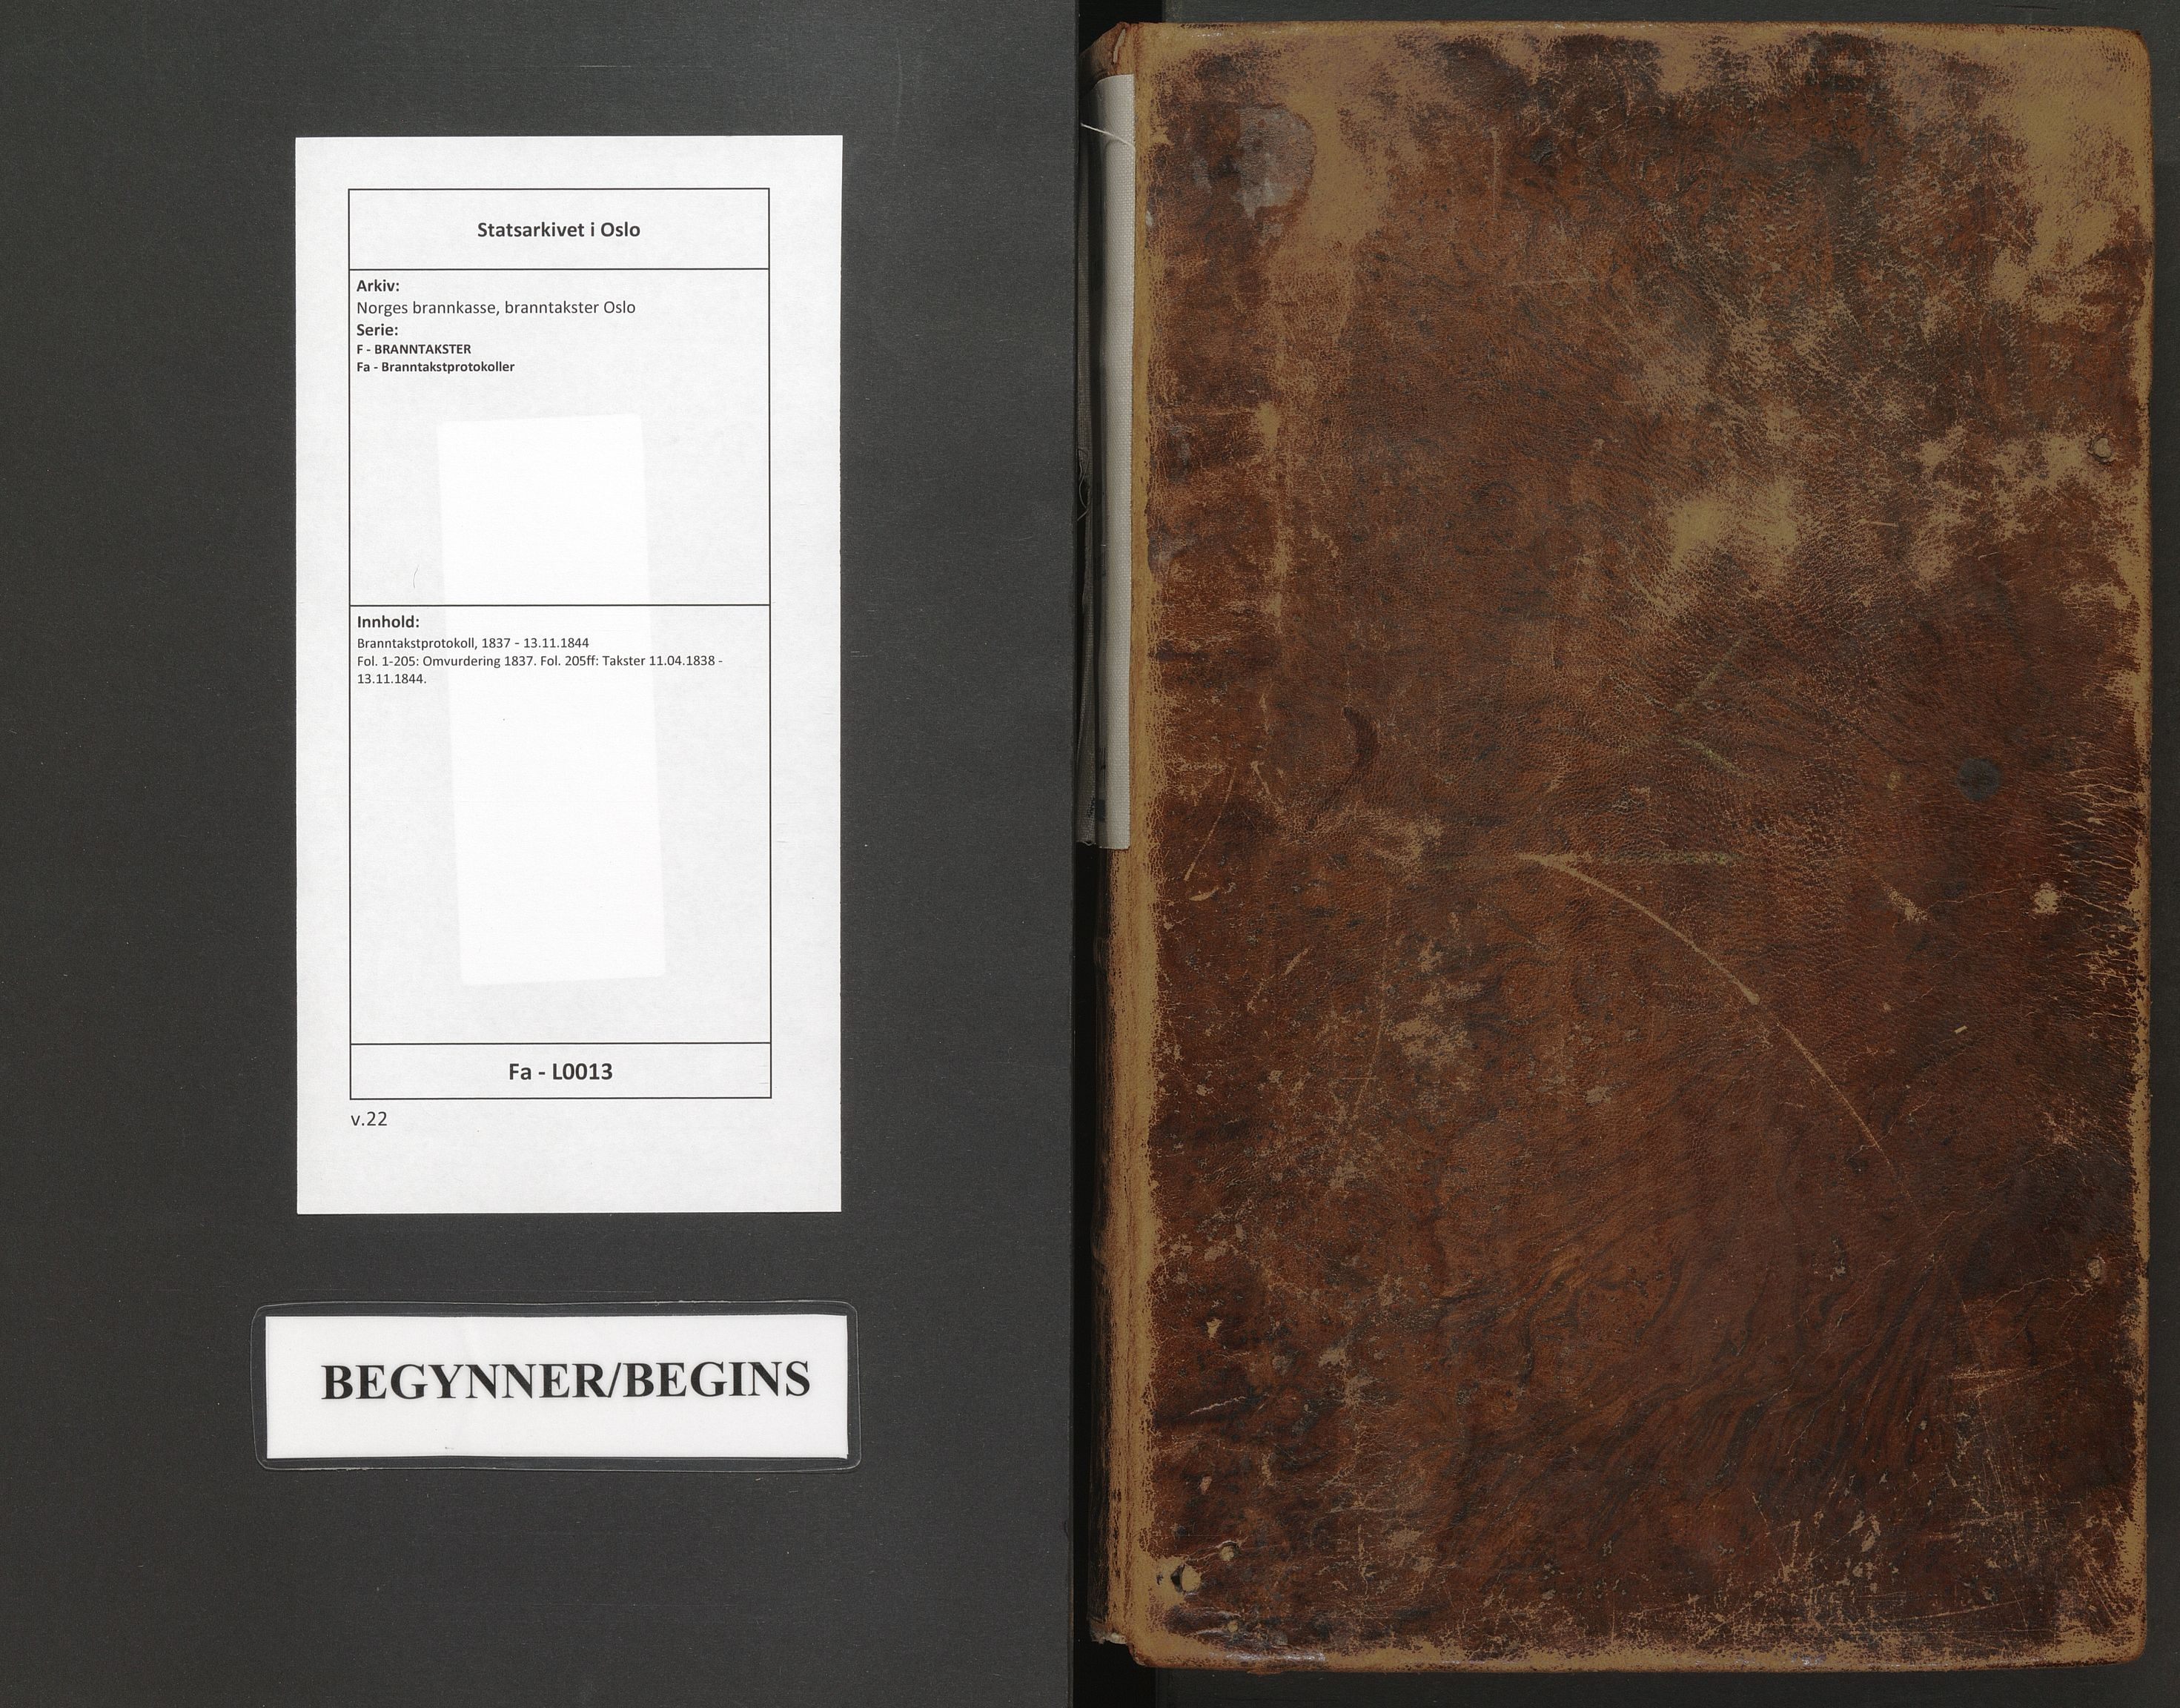 SAO, Norges brannkasse, branntakster Oslo, F/Fa/L0013: Branntakstprotokoll, 1837-1844